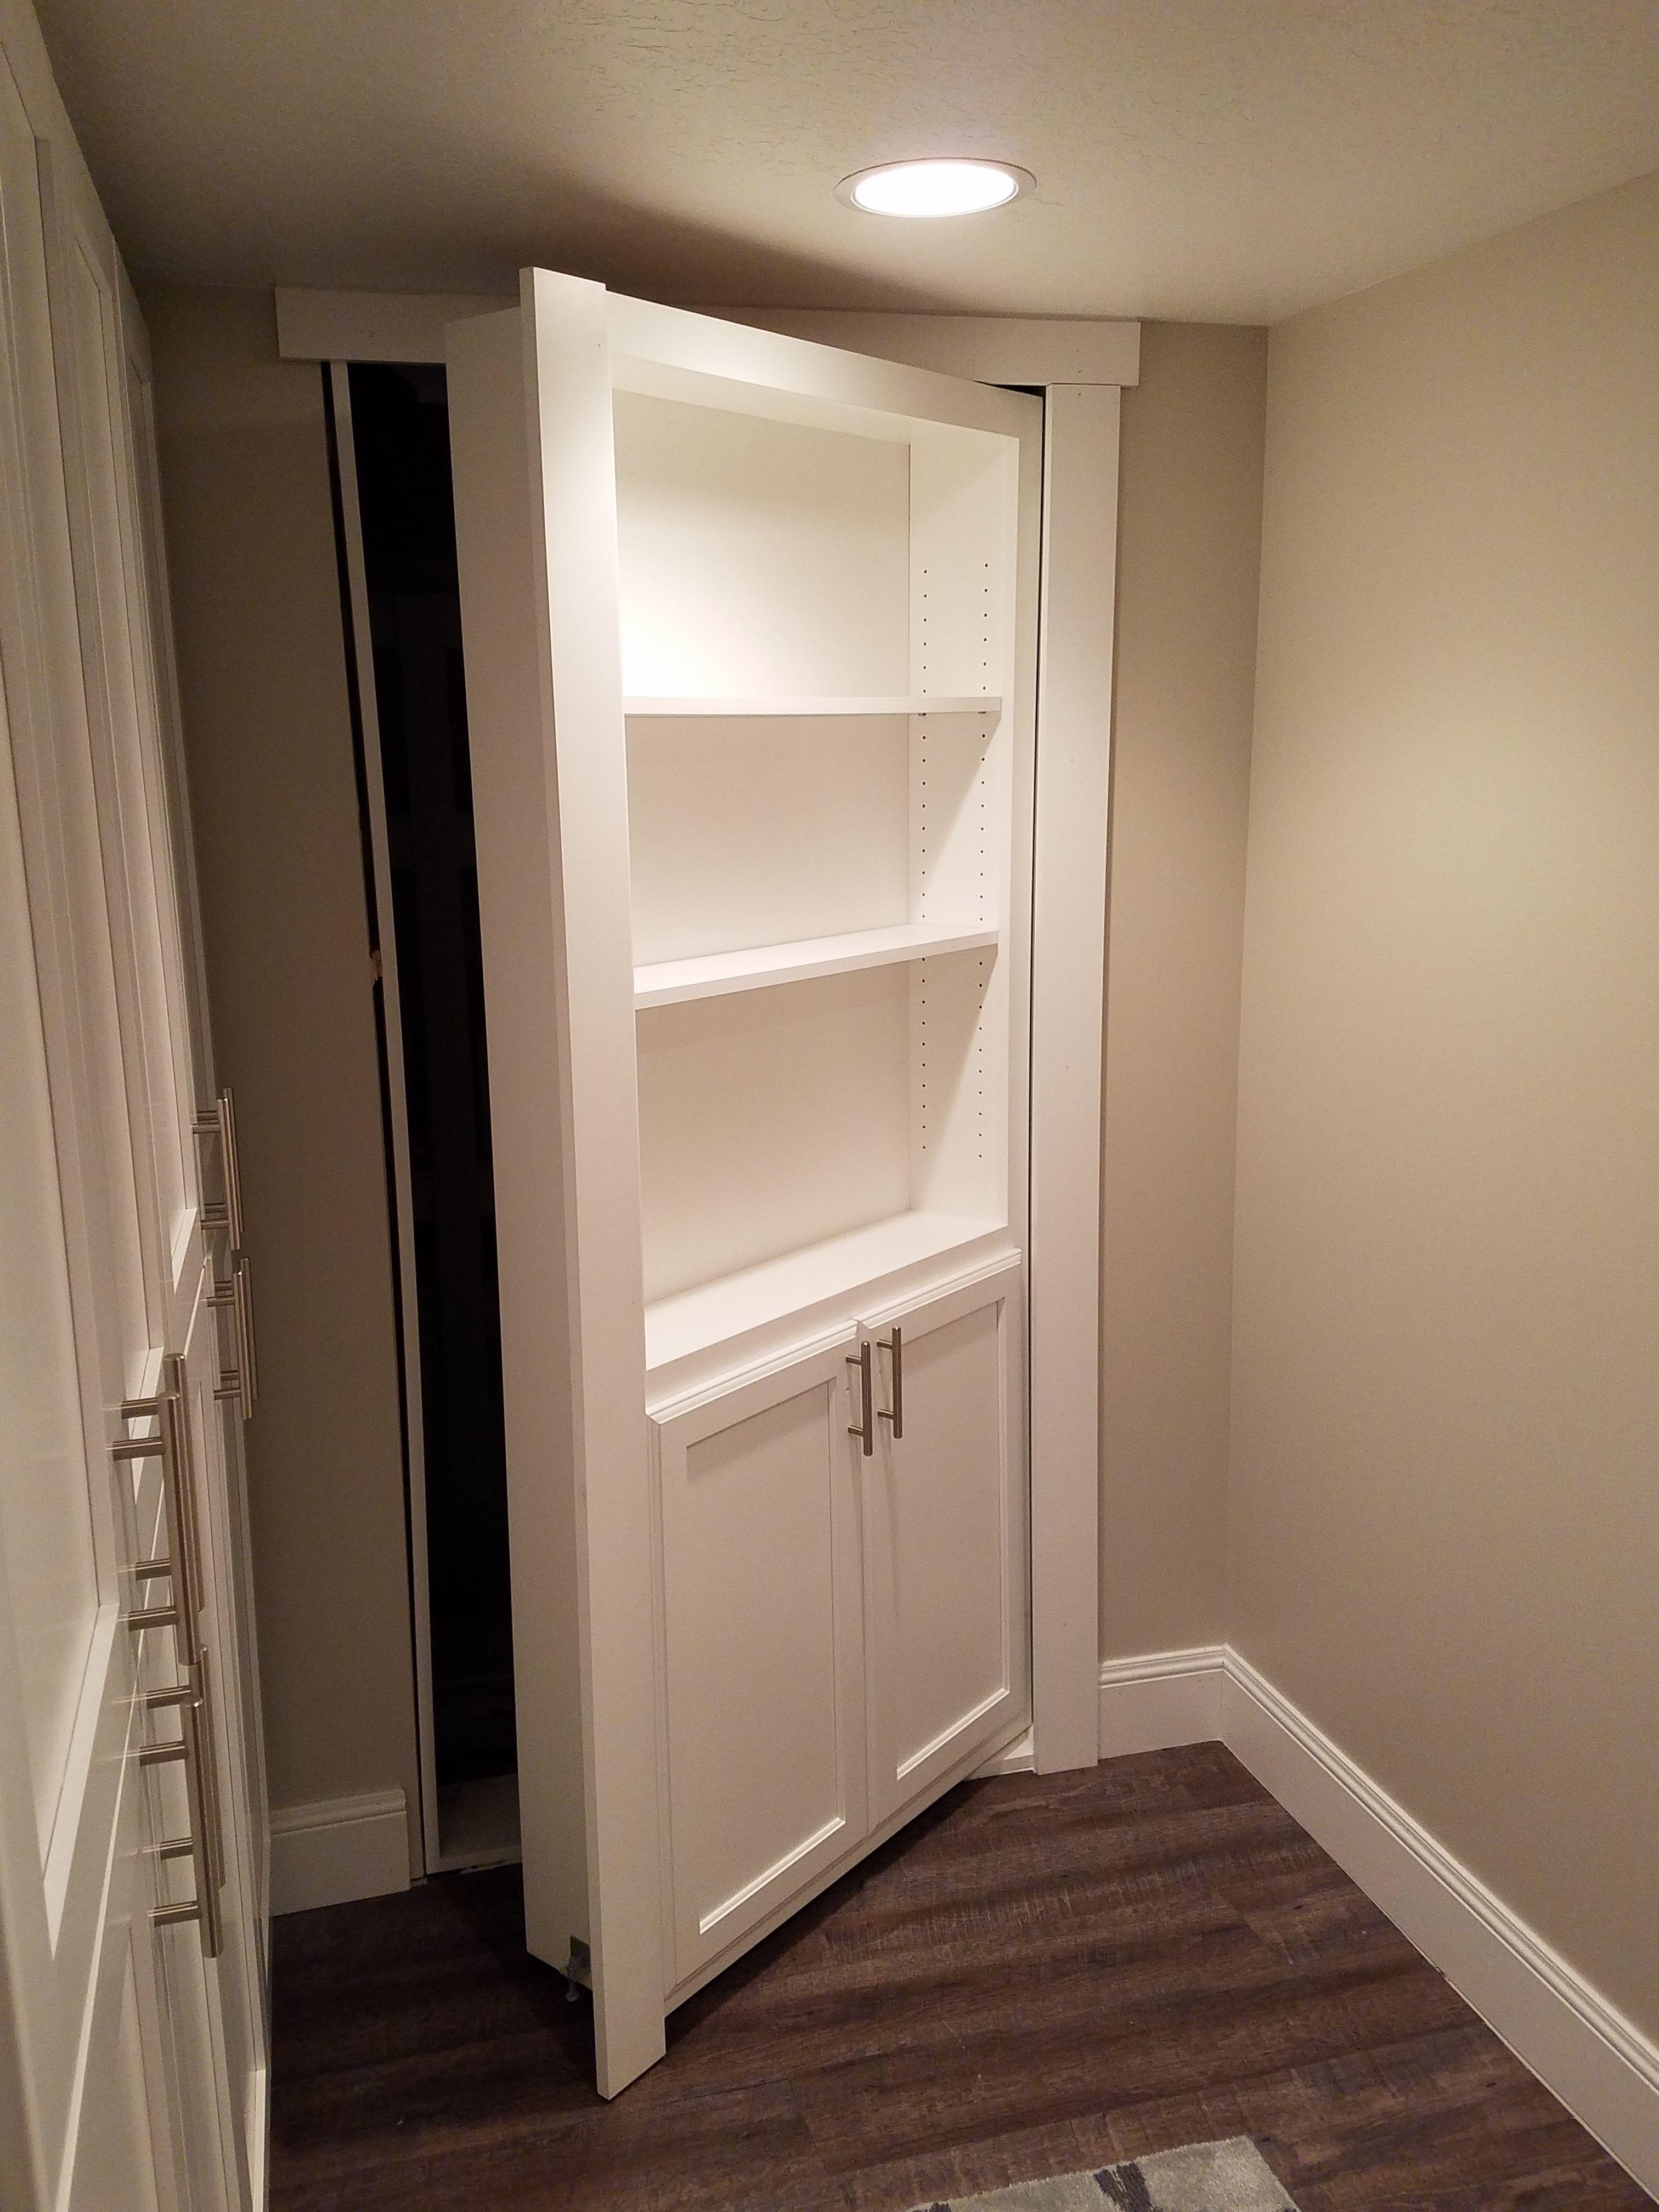 Cold Storage Room Basement